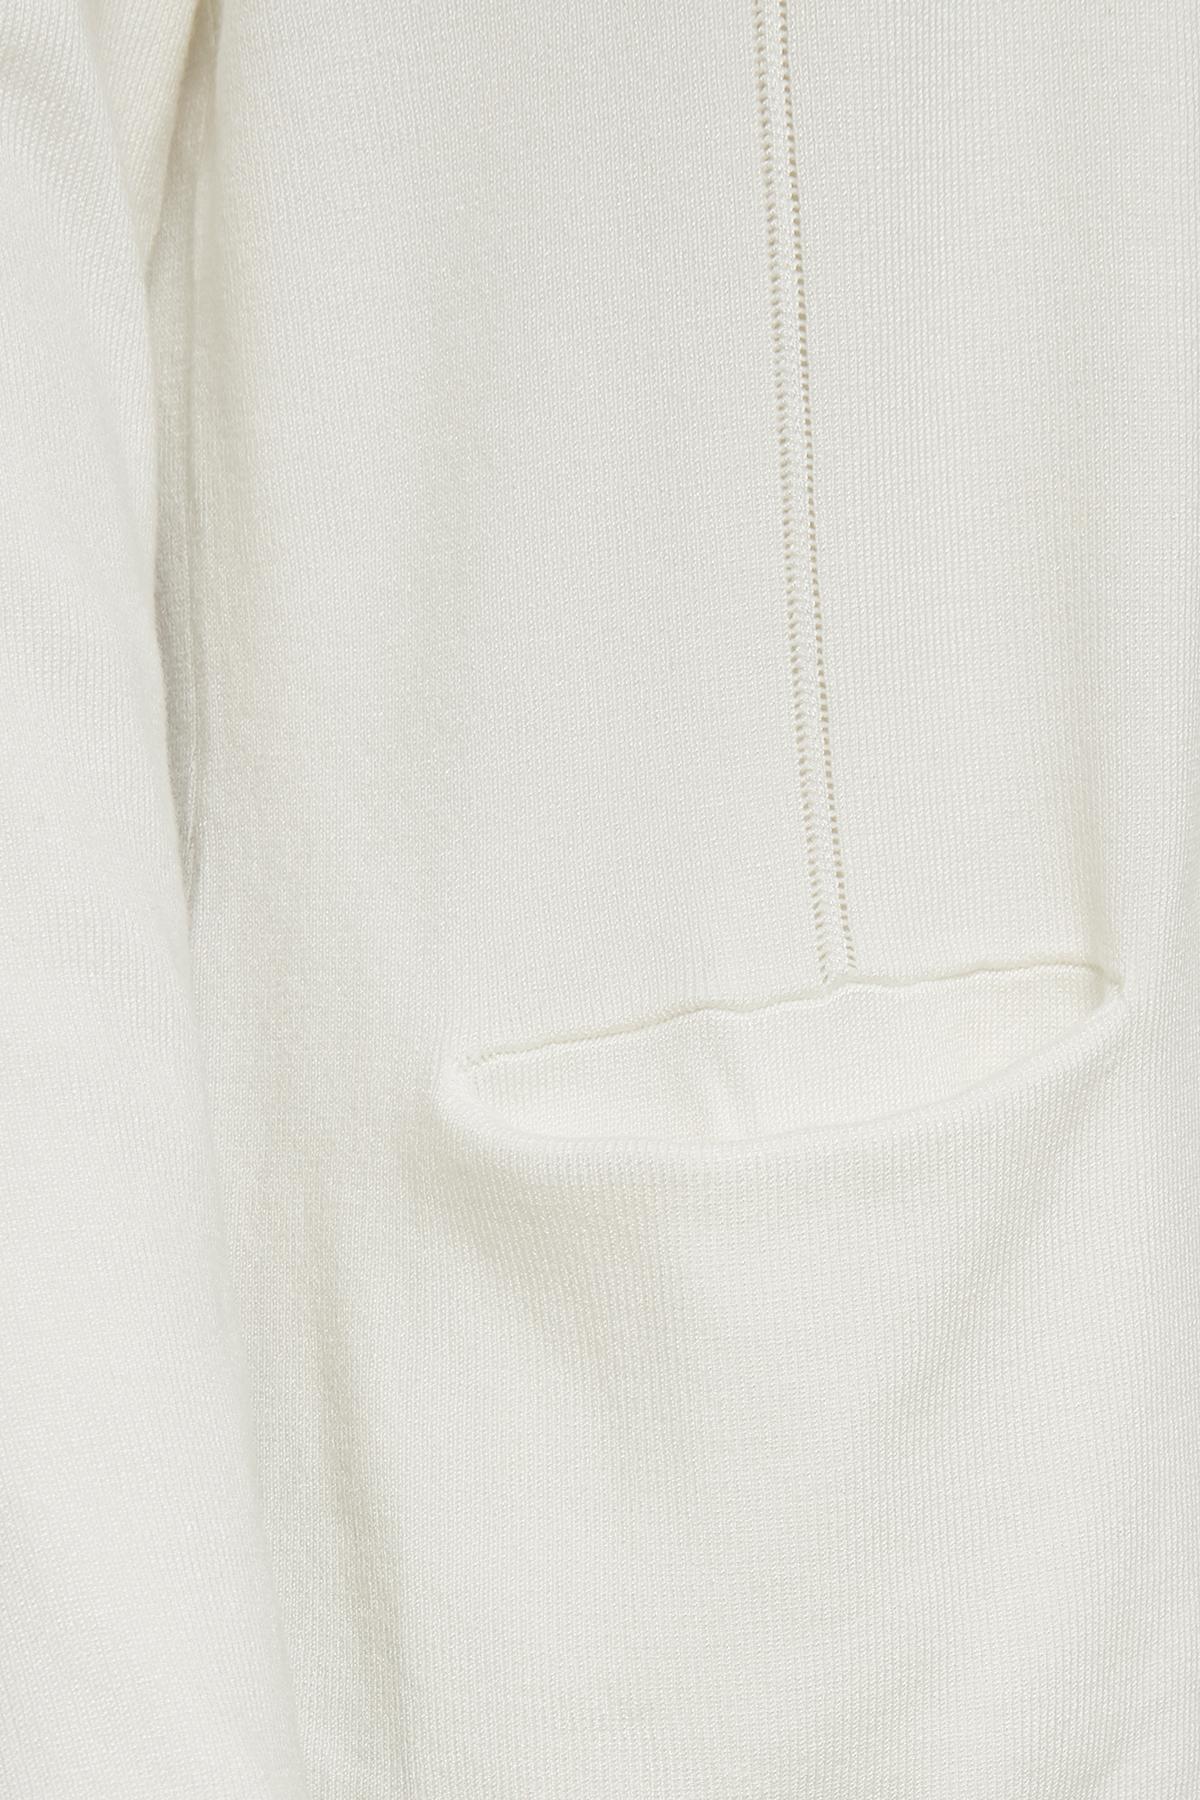 Soft Cream Strikcardigan – Køb Soft Cream Strikcardigan fra str. XS-XL her